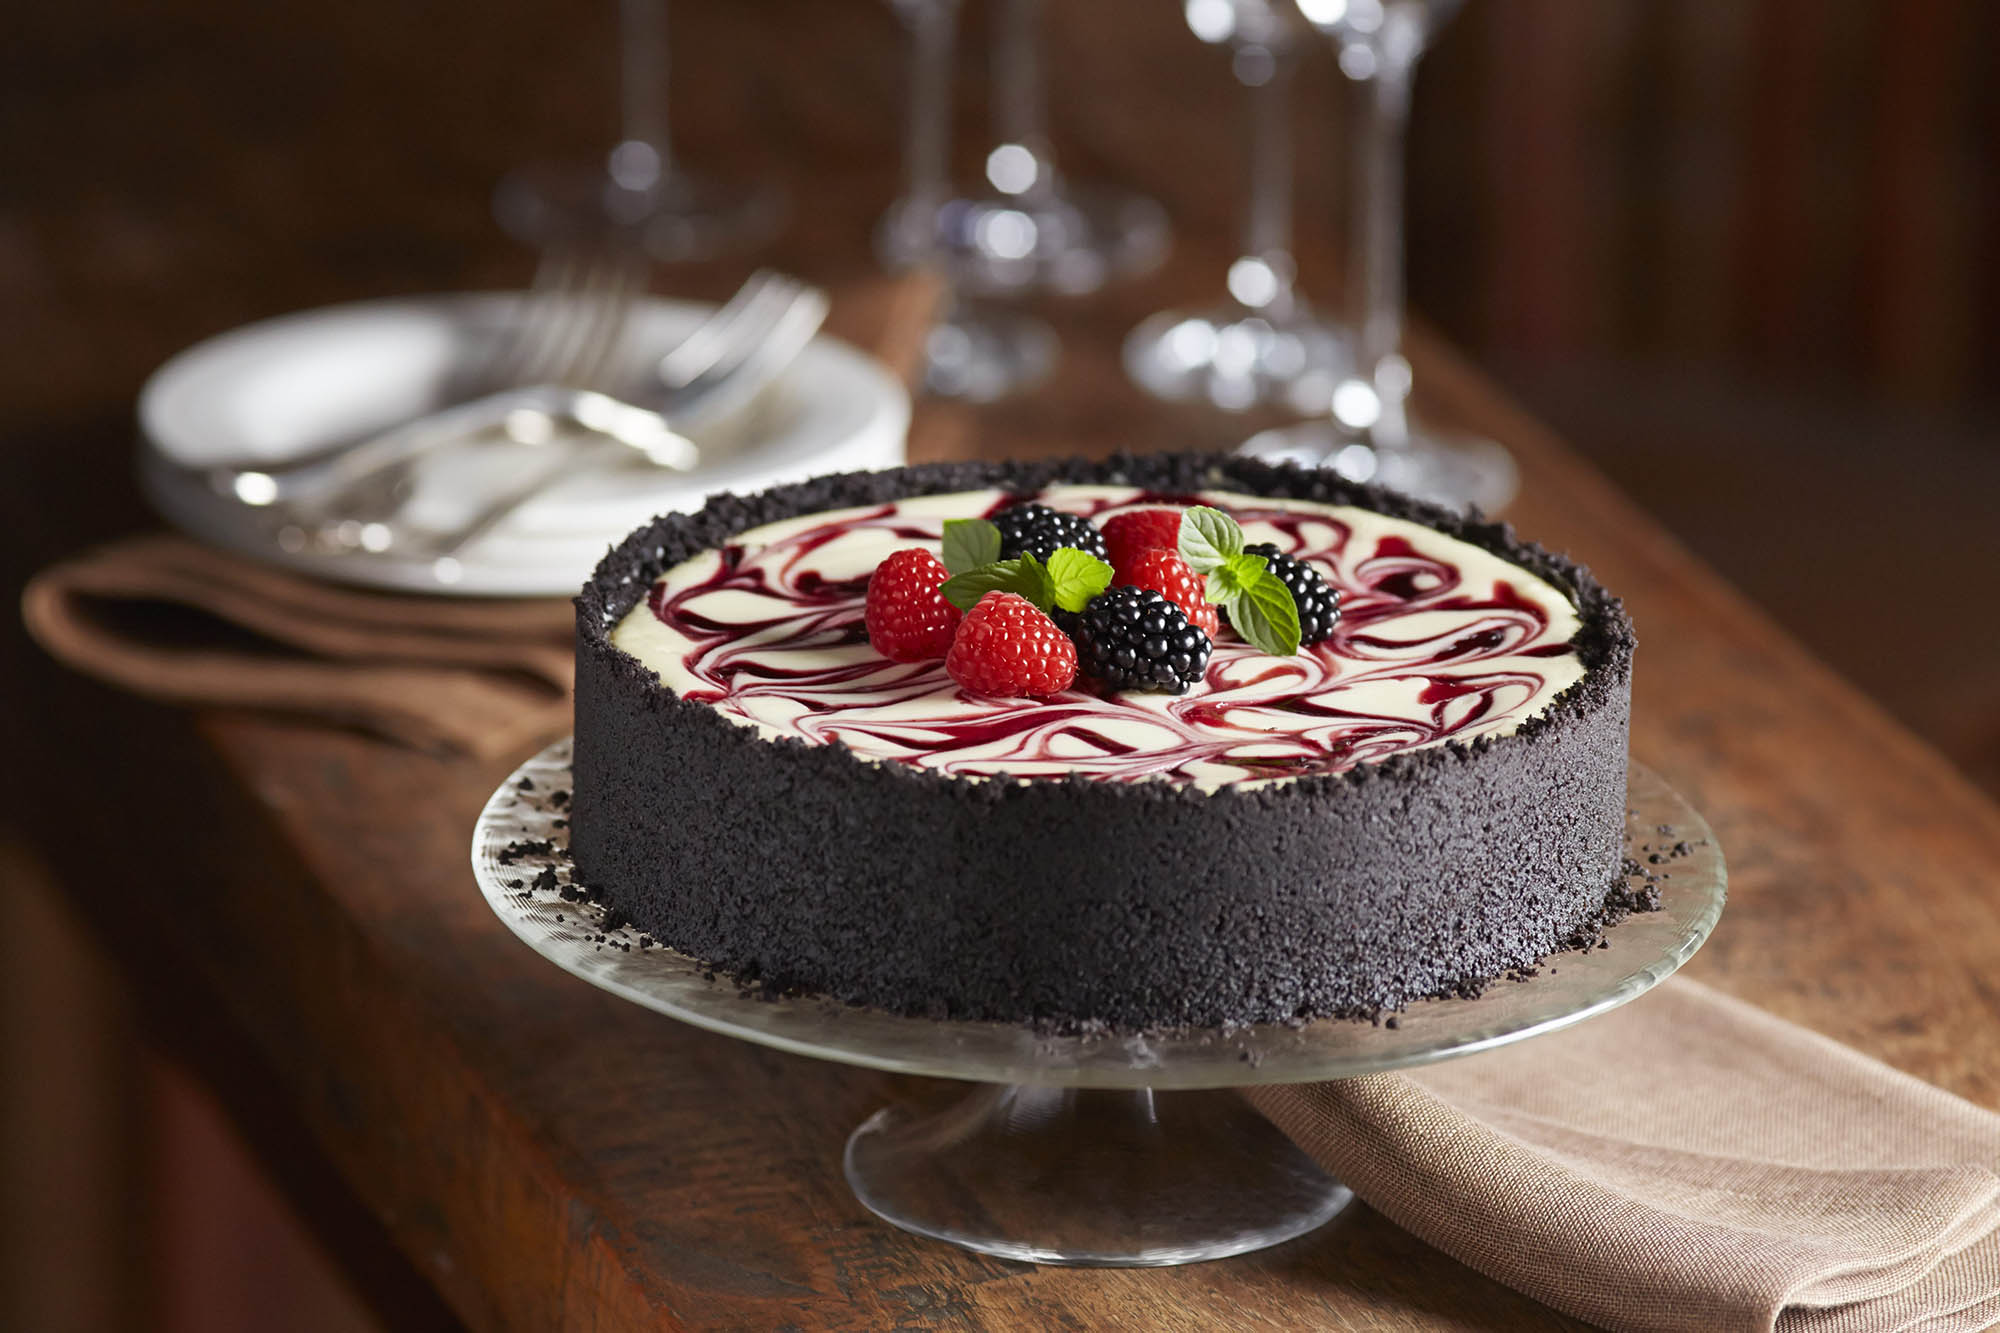 Blackberry and Raspberry Swirl Cheesecake